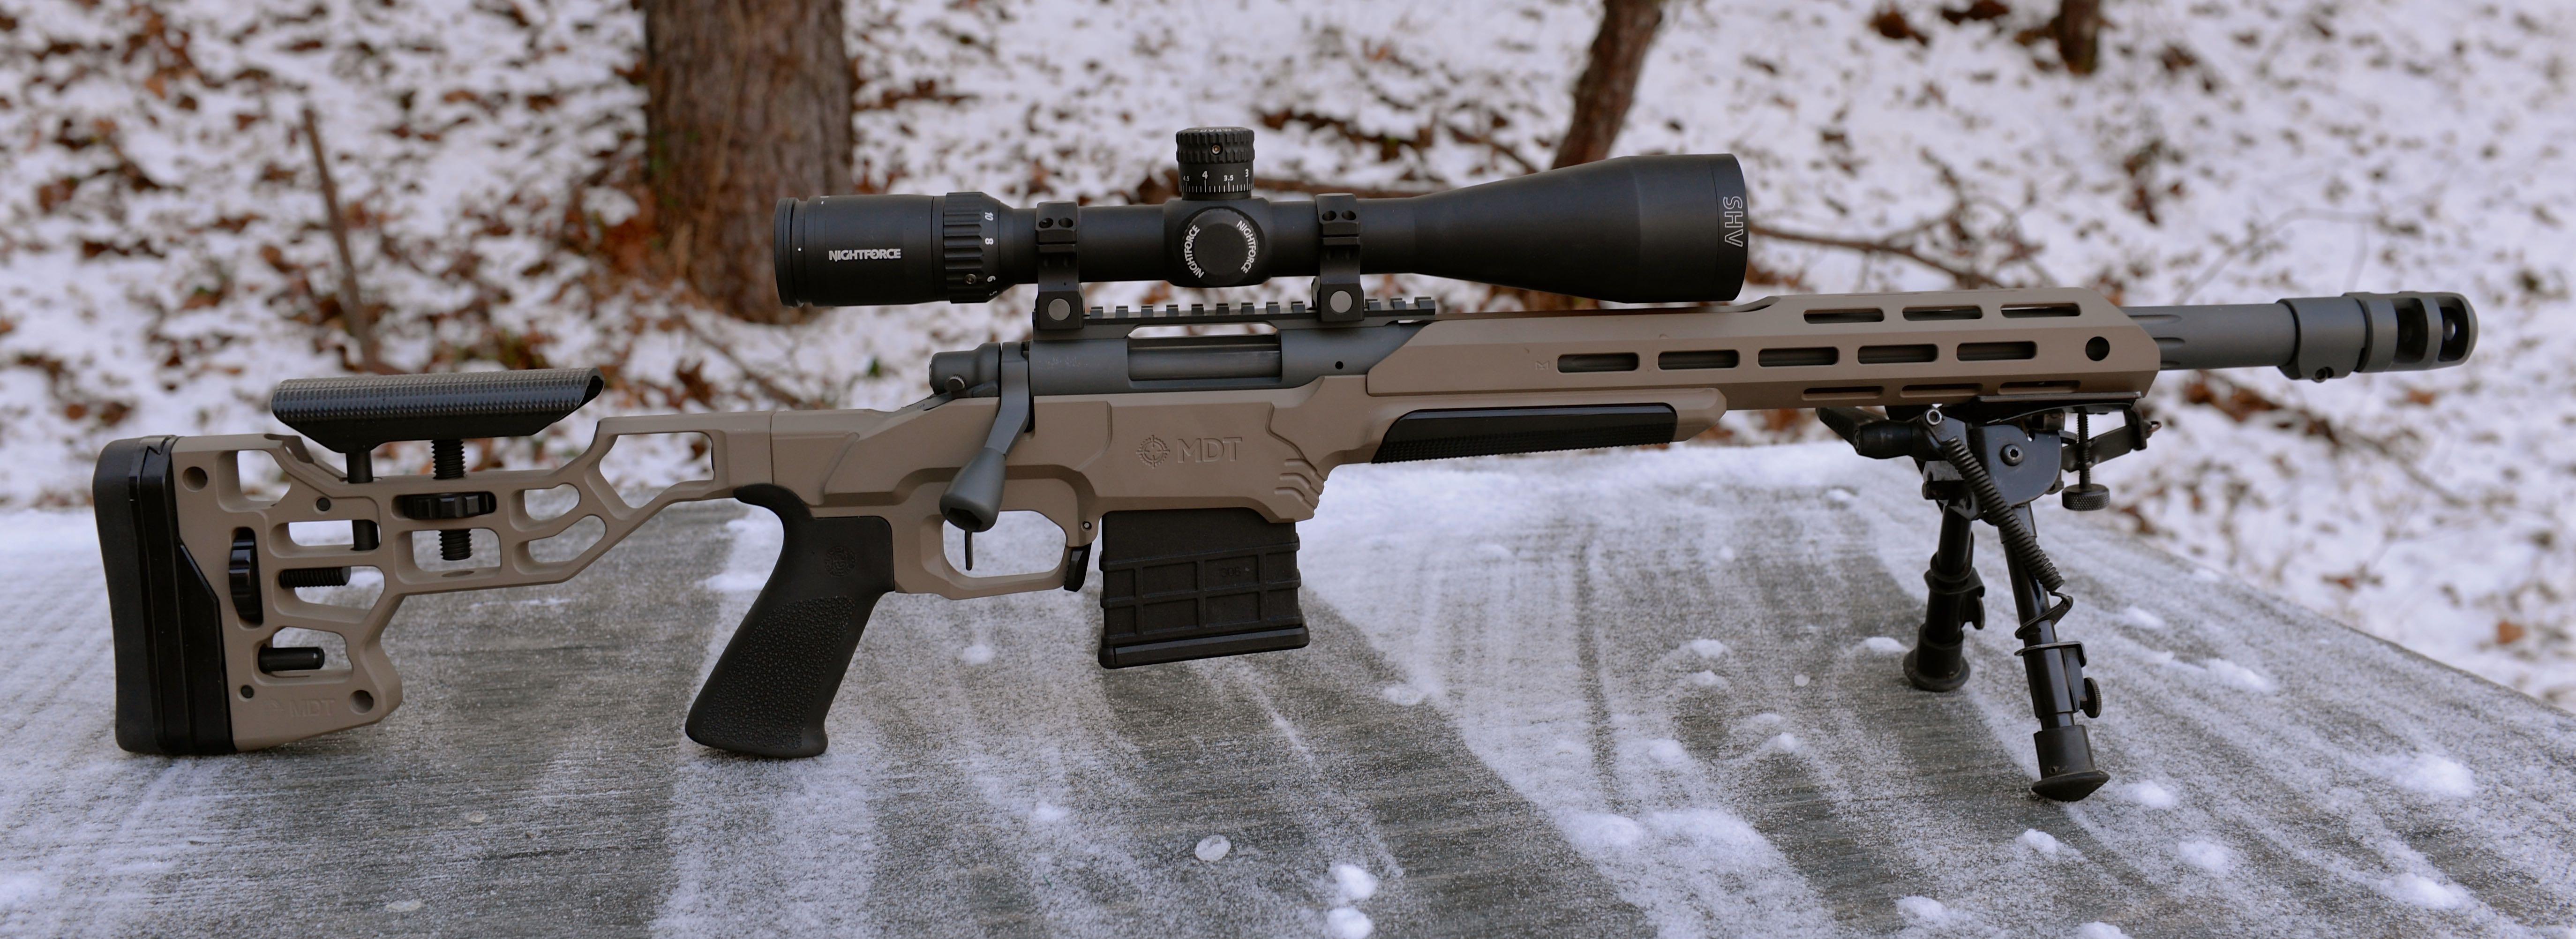 Modular Driven Technologies Mdt Elite Sniper System Ess